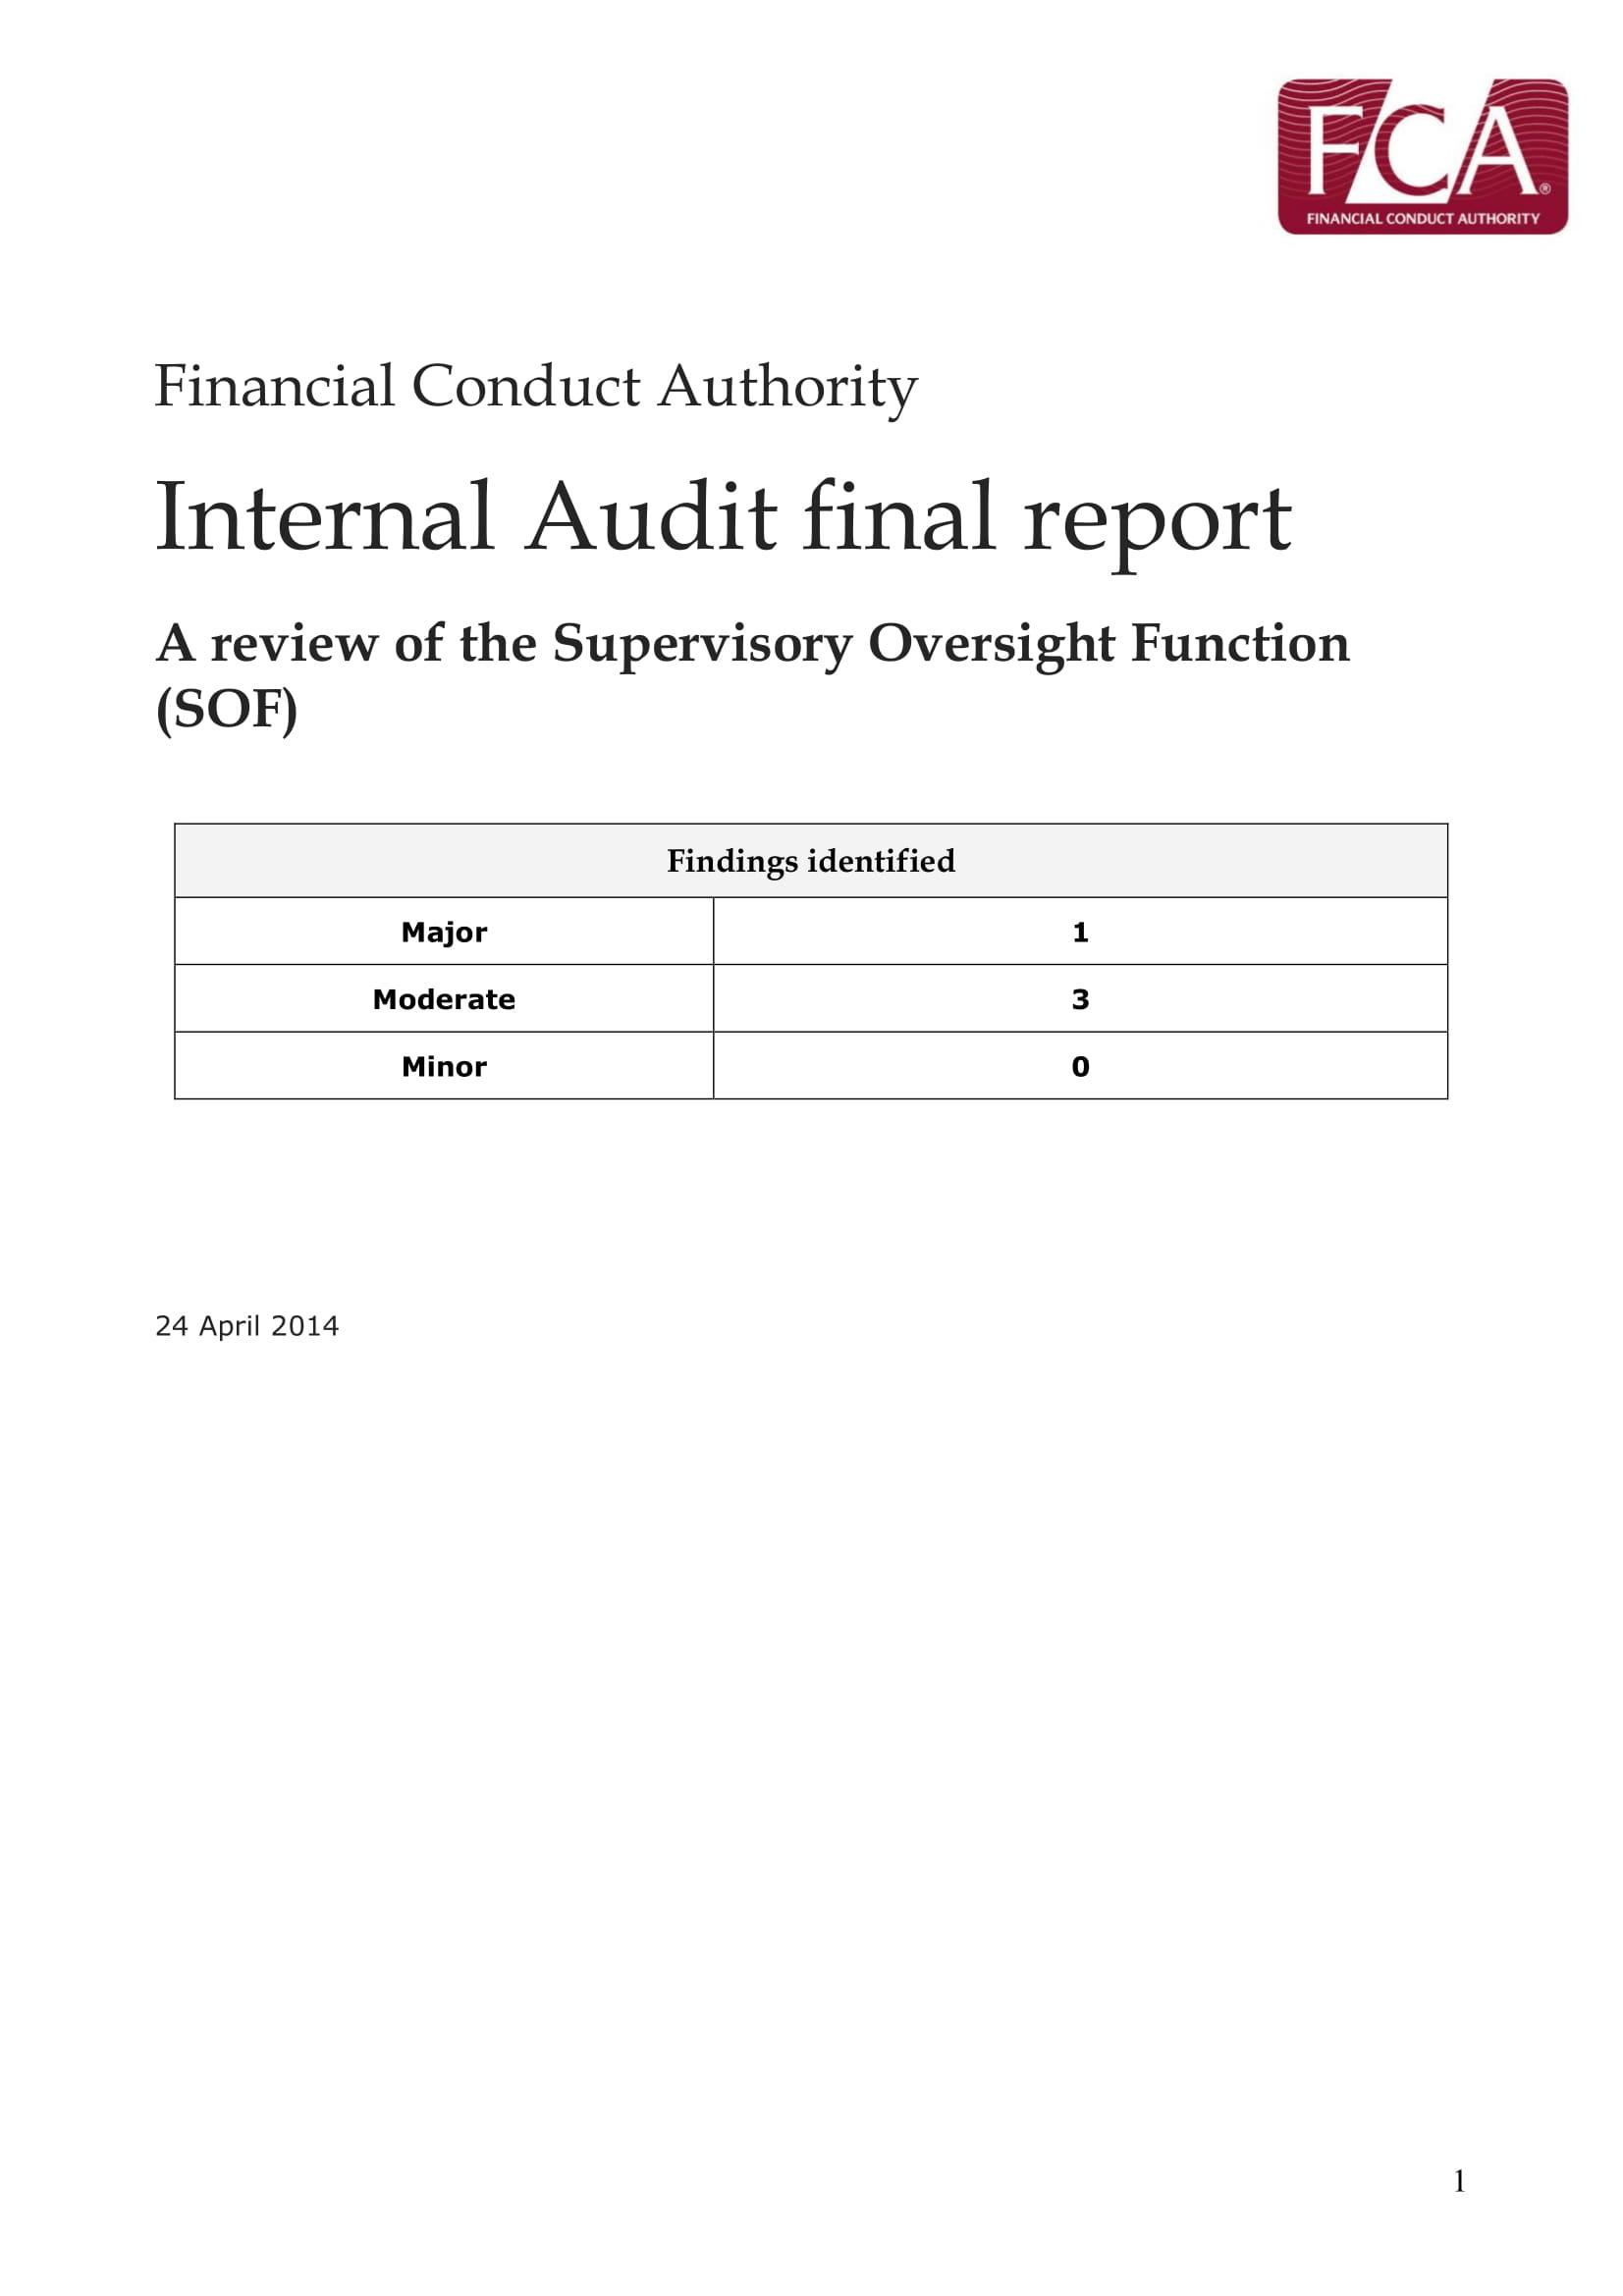 internal audit final report example 1